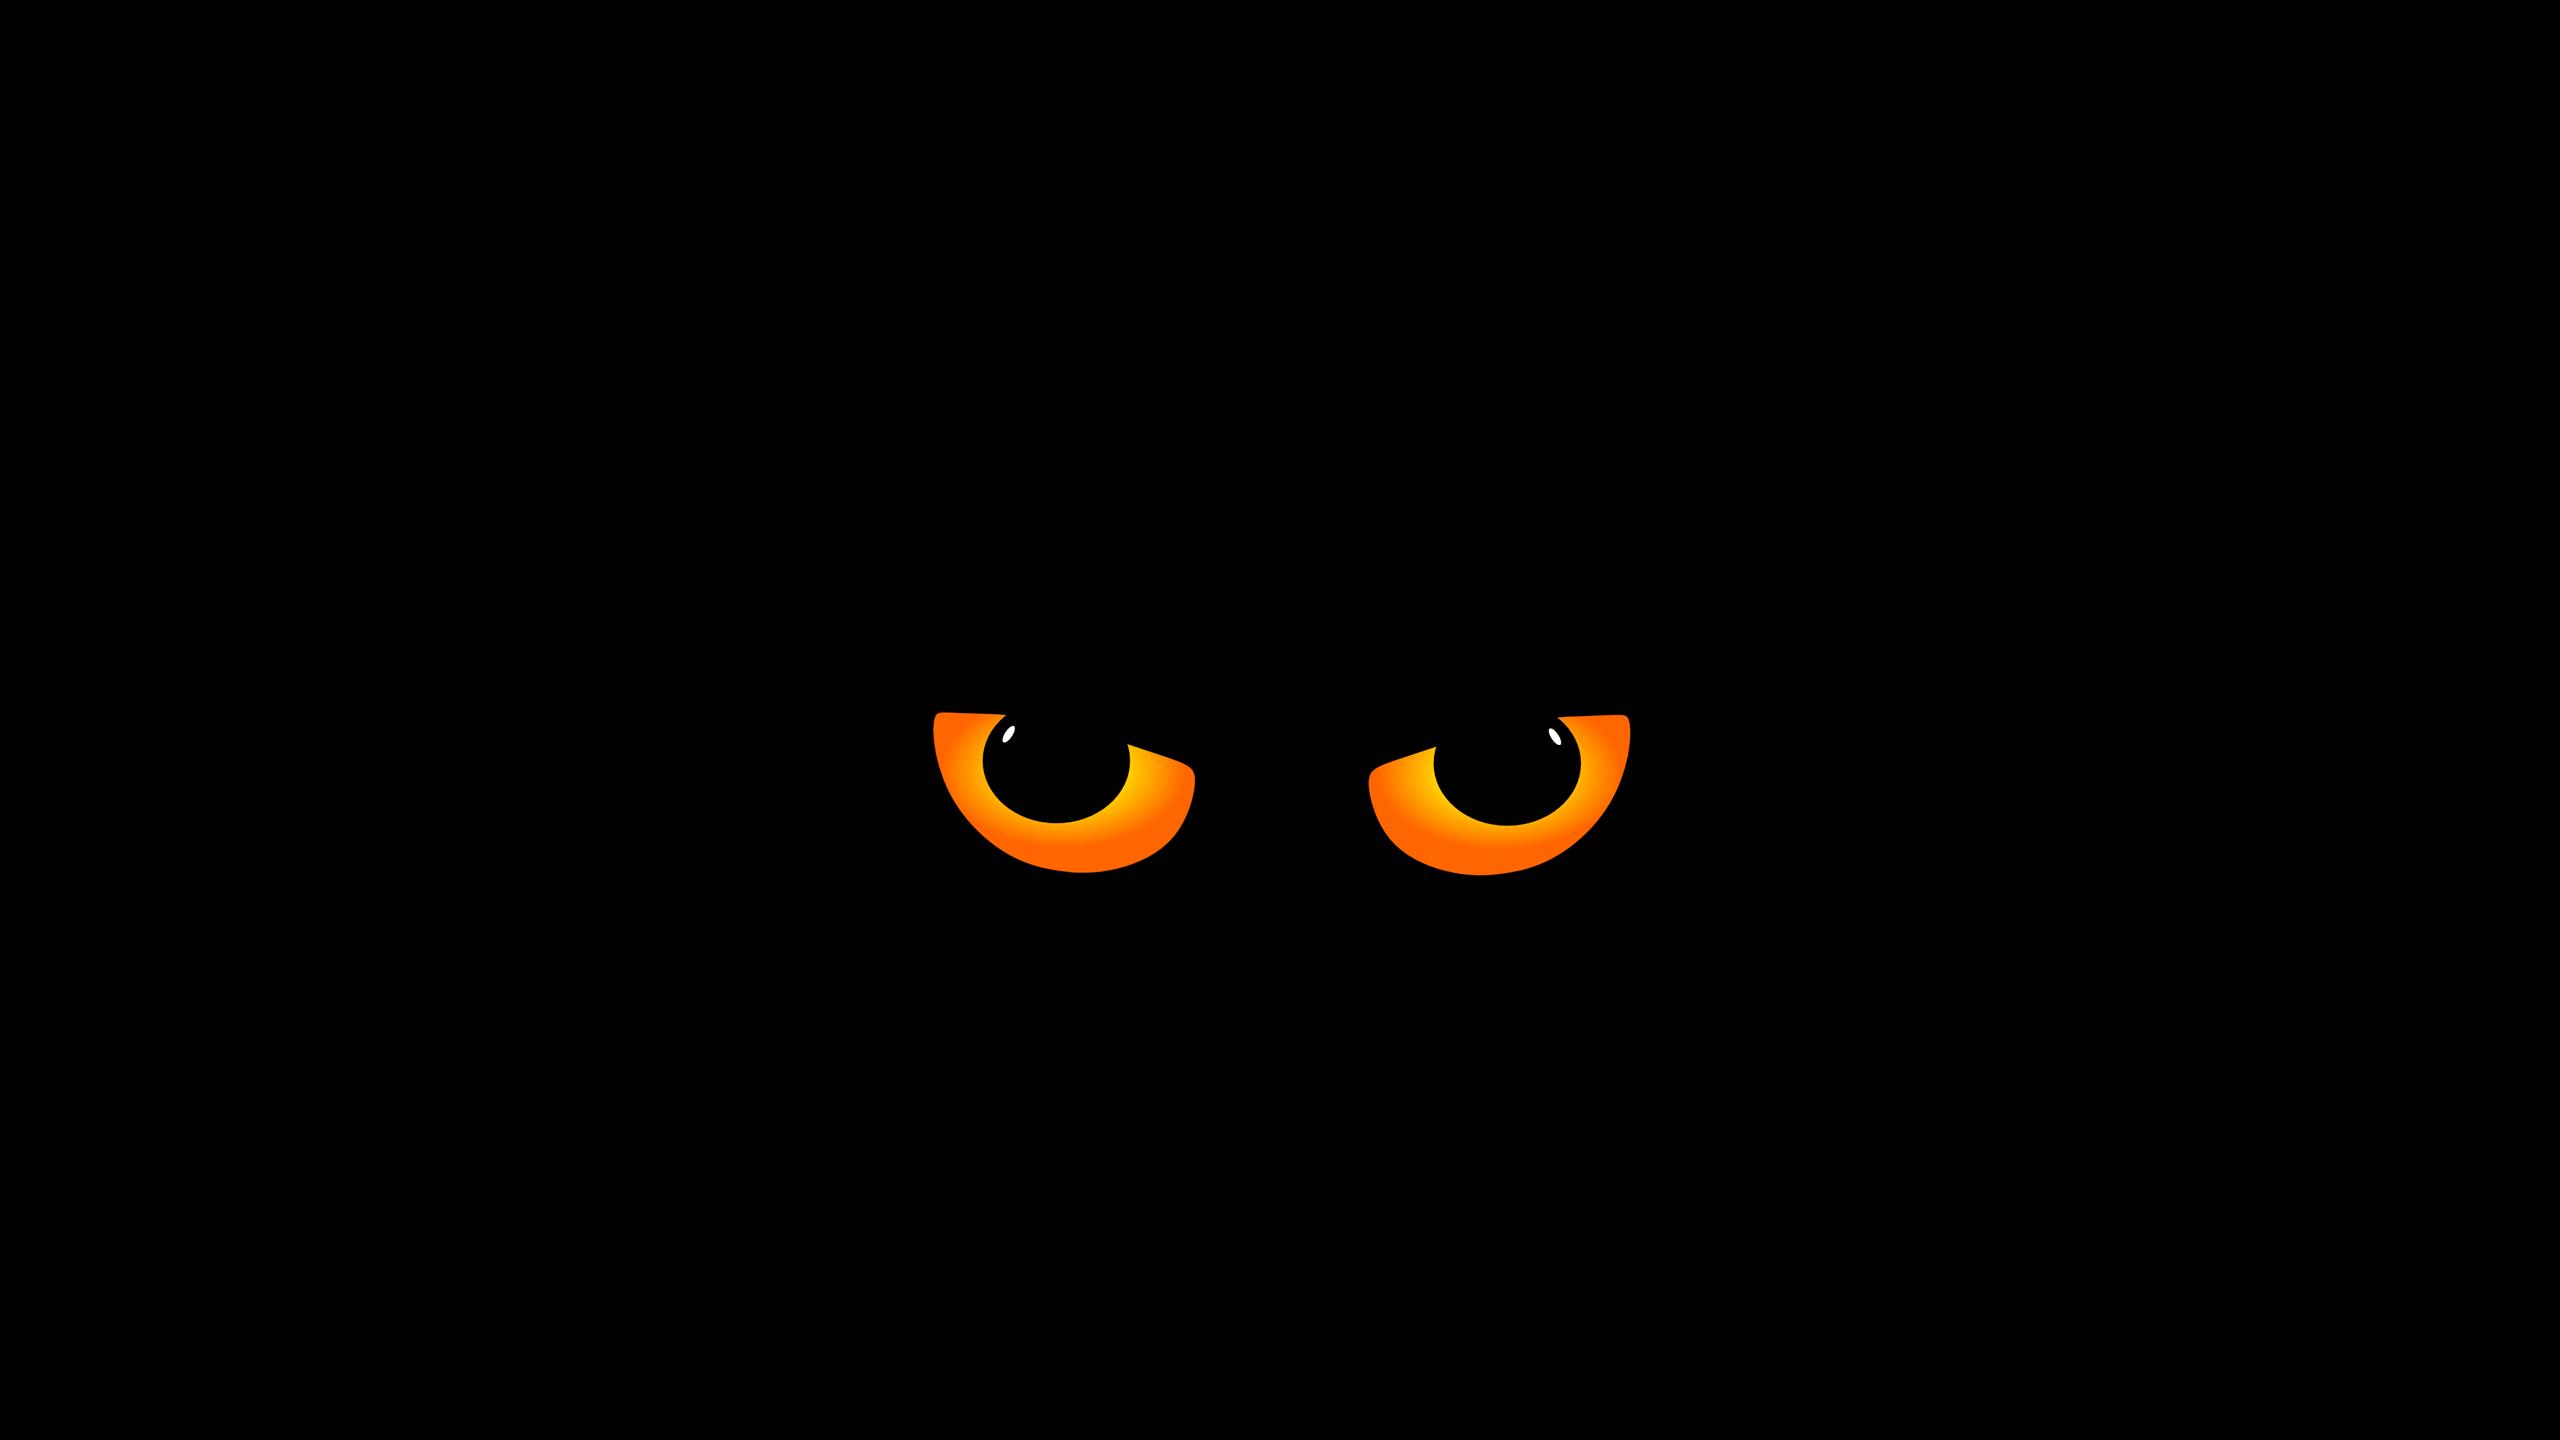 Böse Augen  Handy Wallpaper